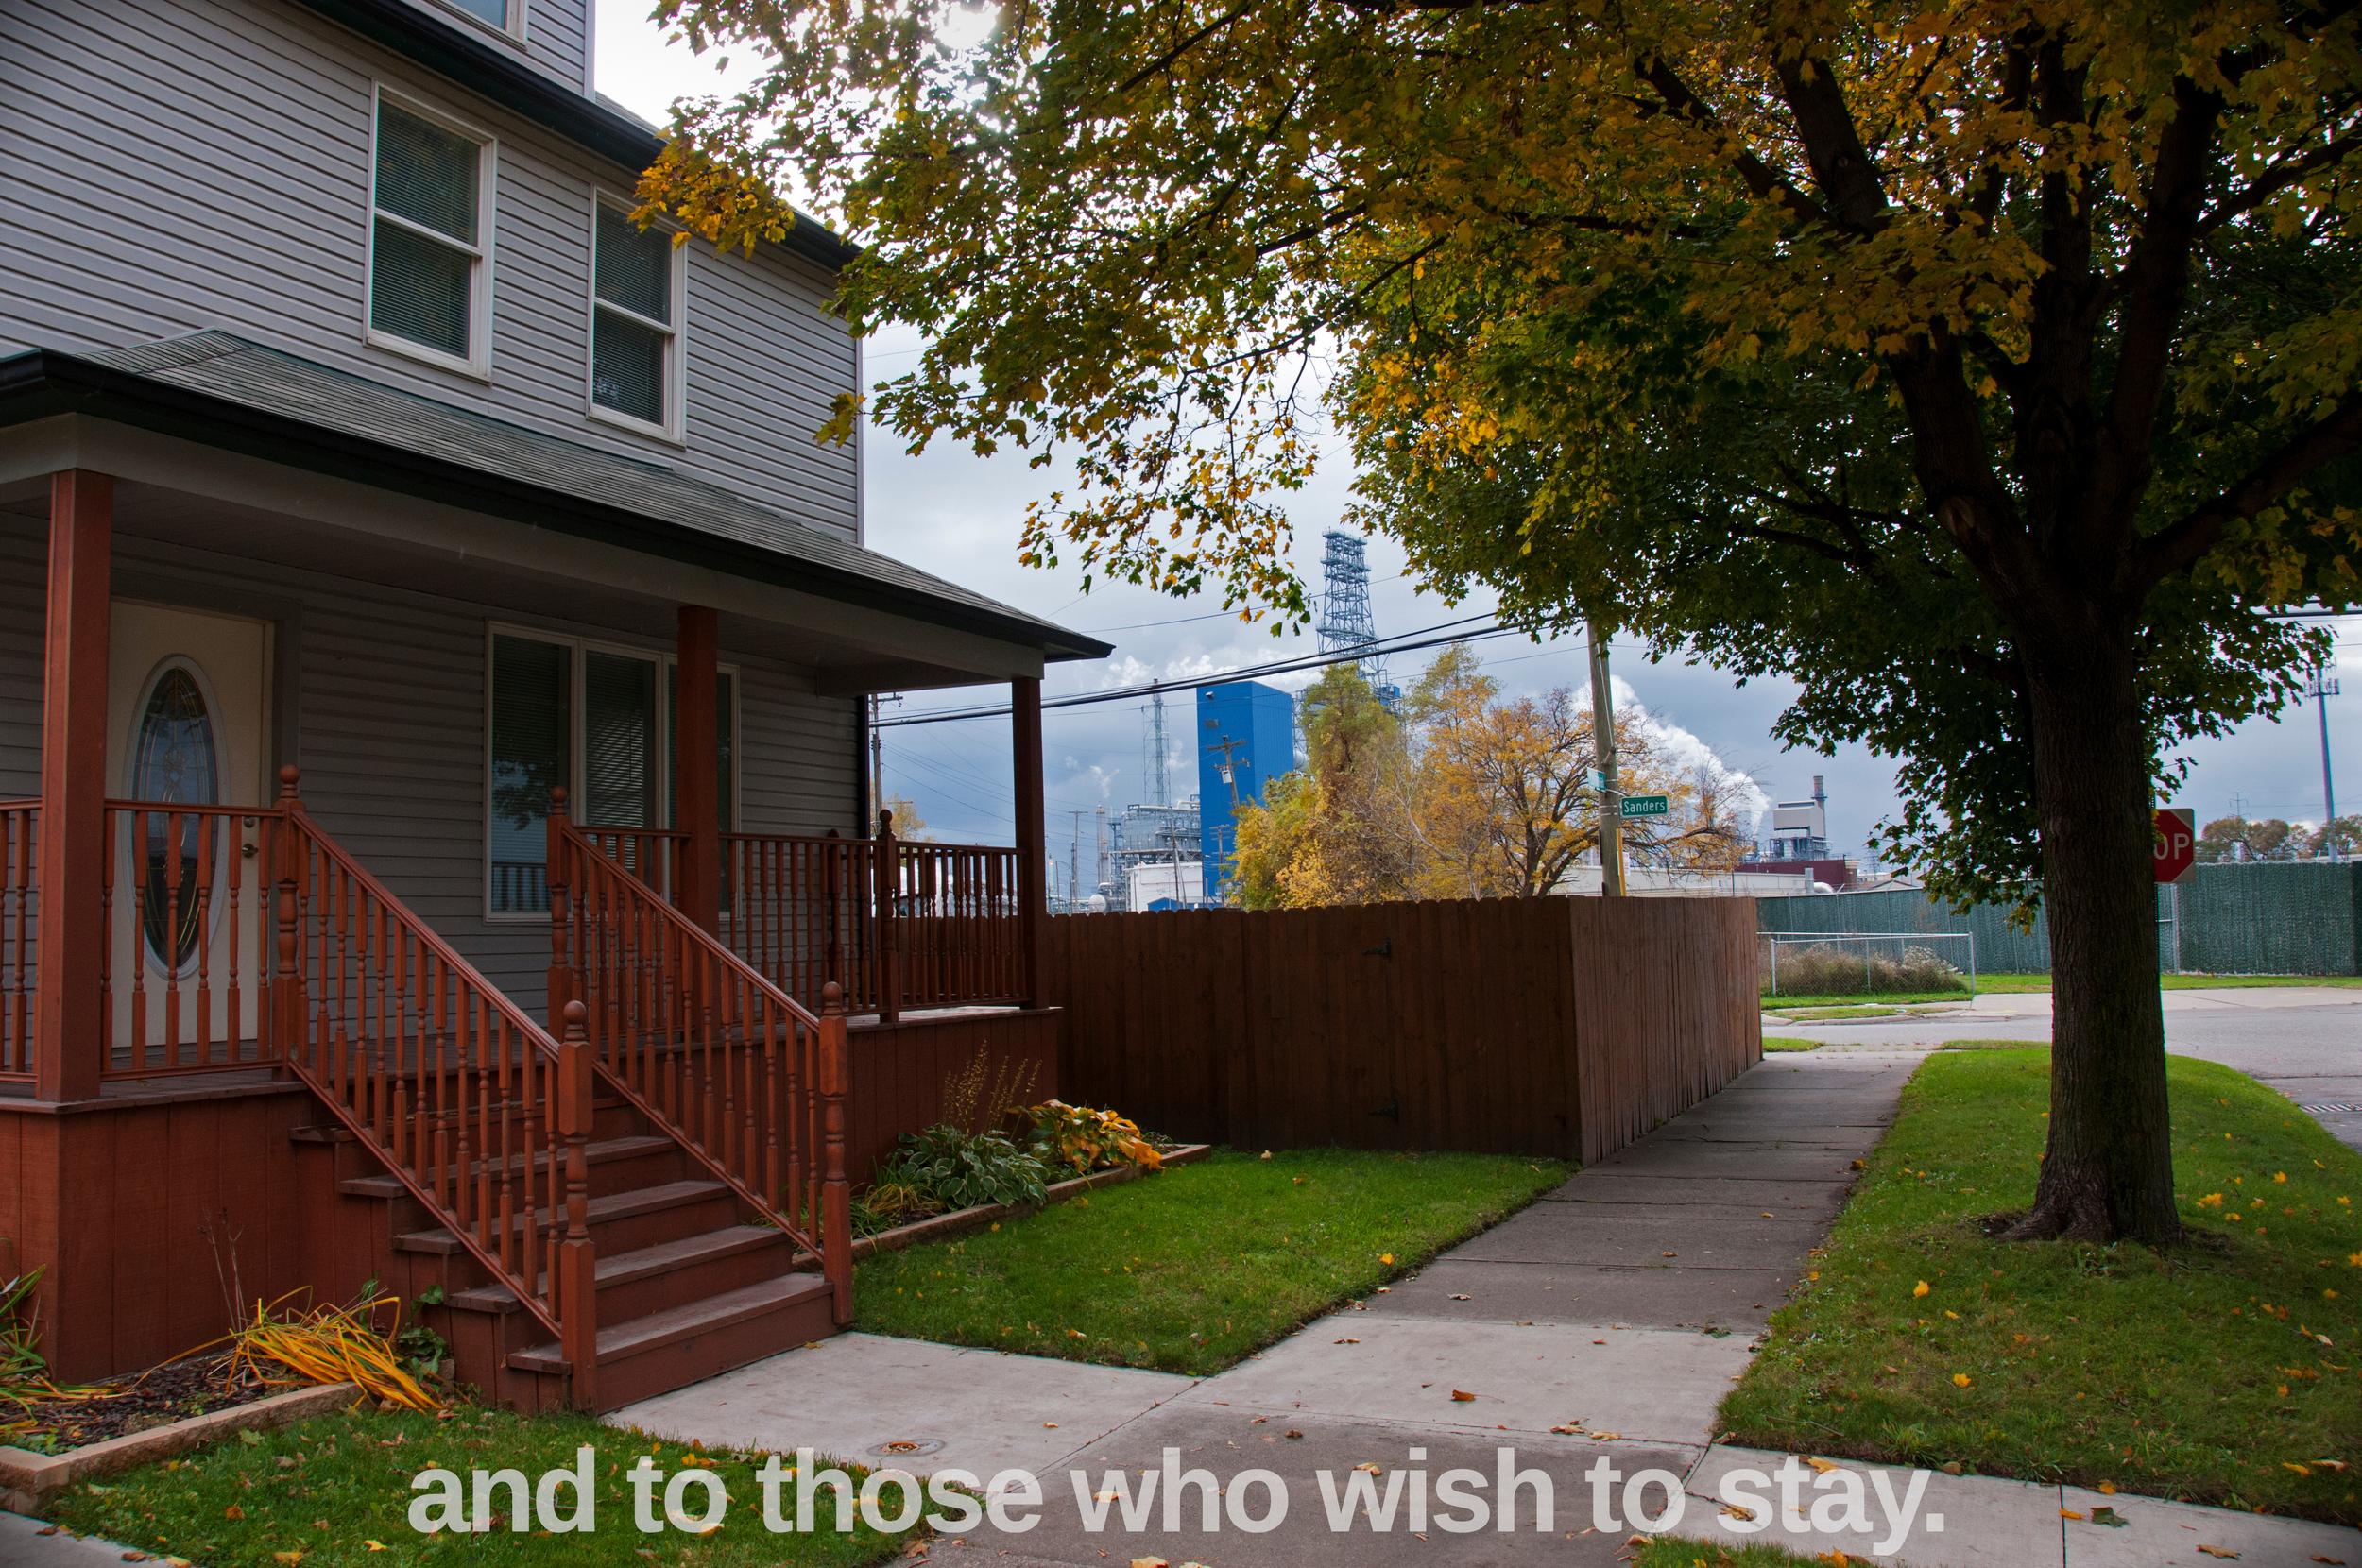 6-Pretty+House-wish+to+stay-3578943855-O.jpg